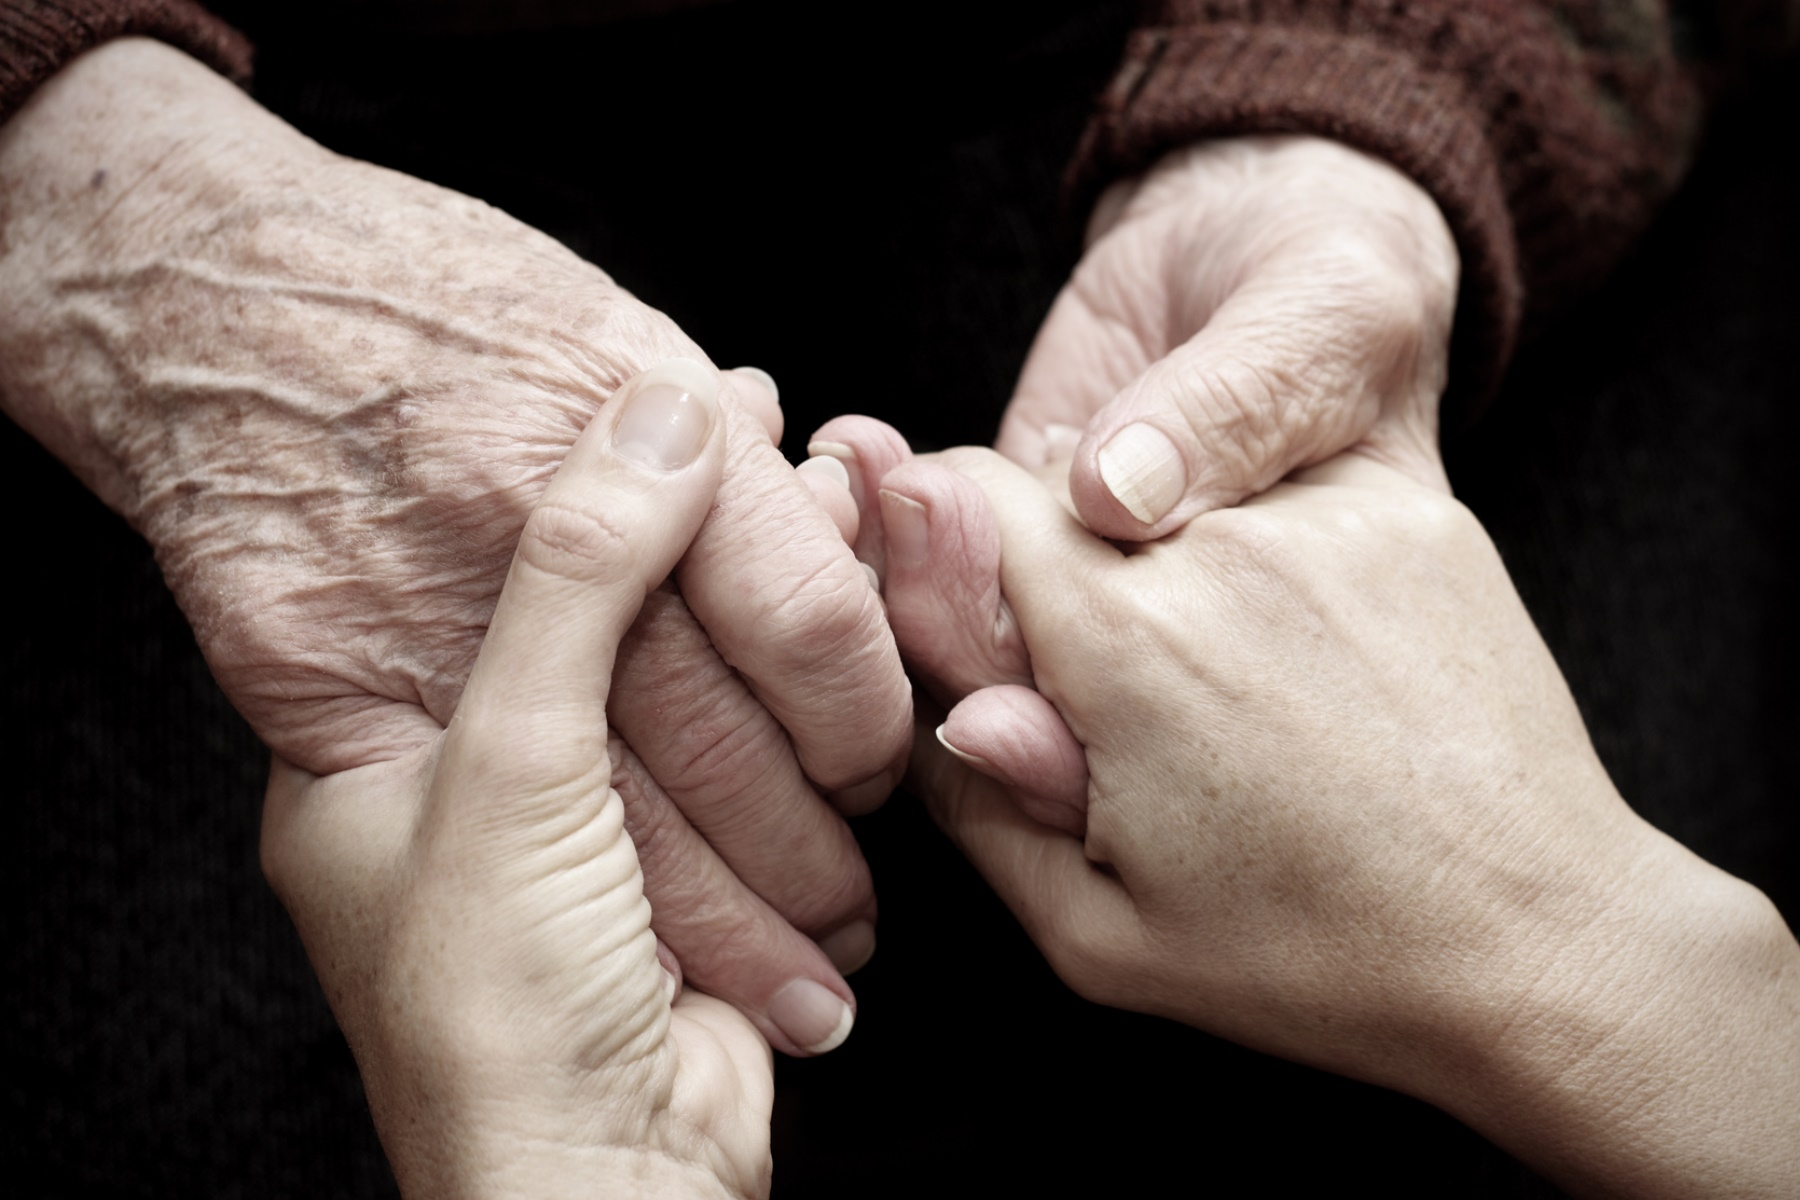 Familienangehörige sollen Patienten begleiten dürfen